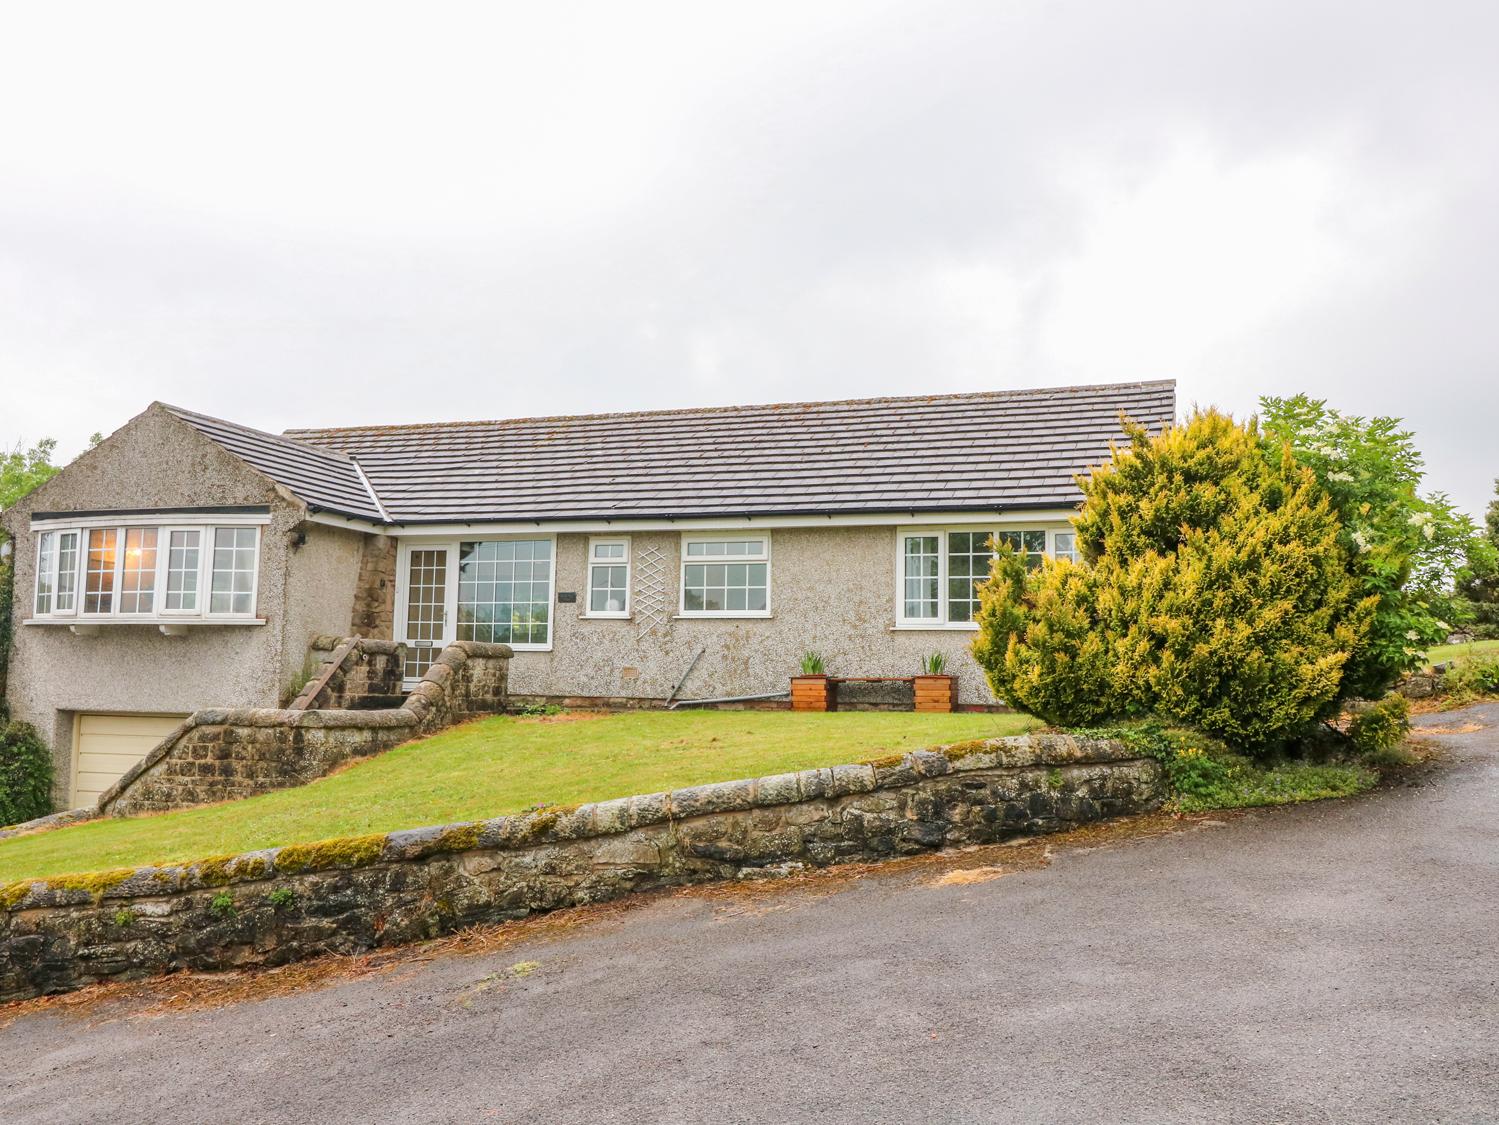 3 bedroom Cottage for rent in Wirksworth